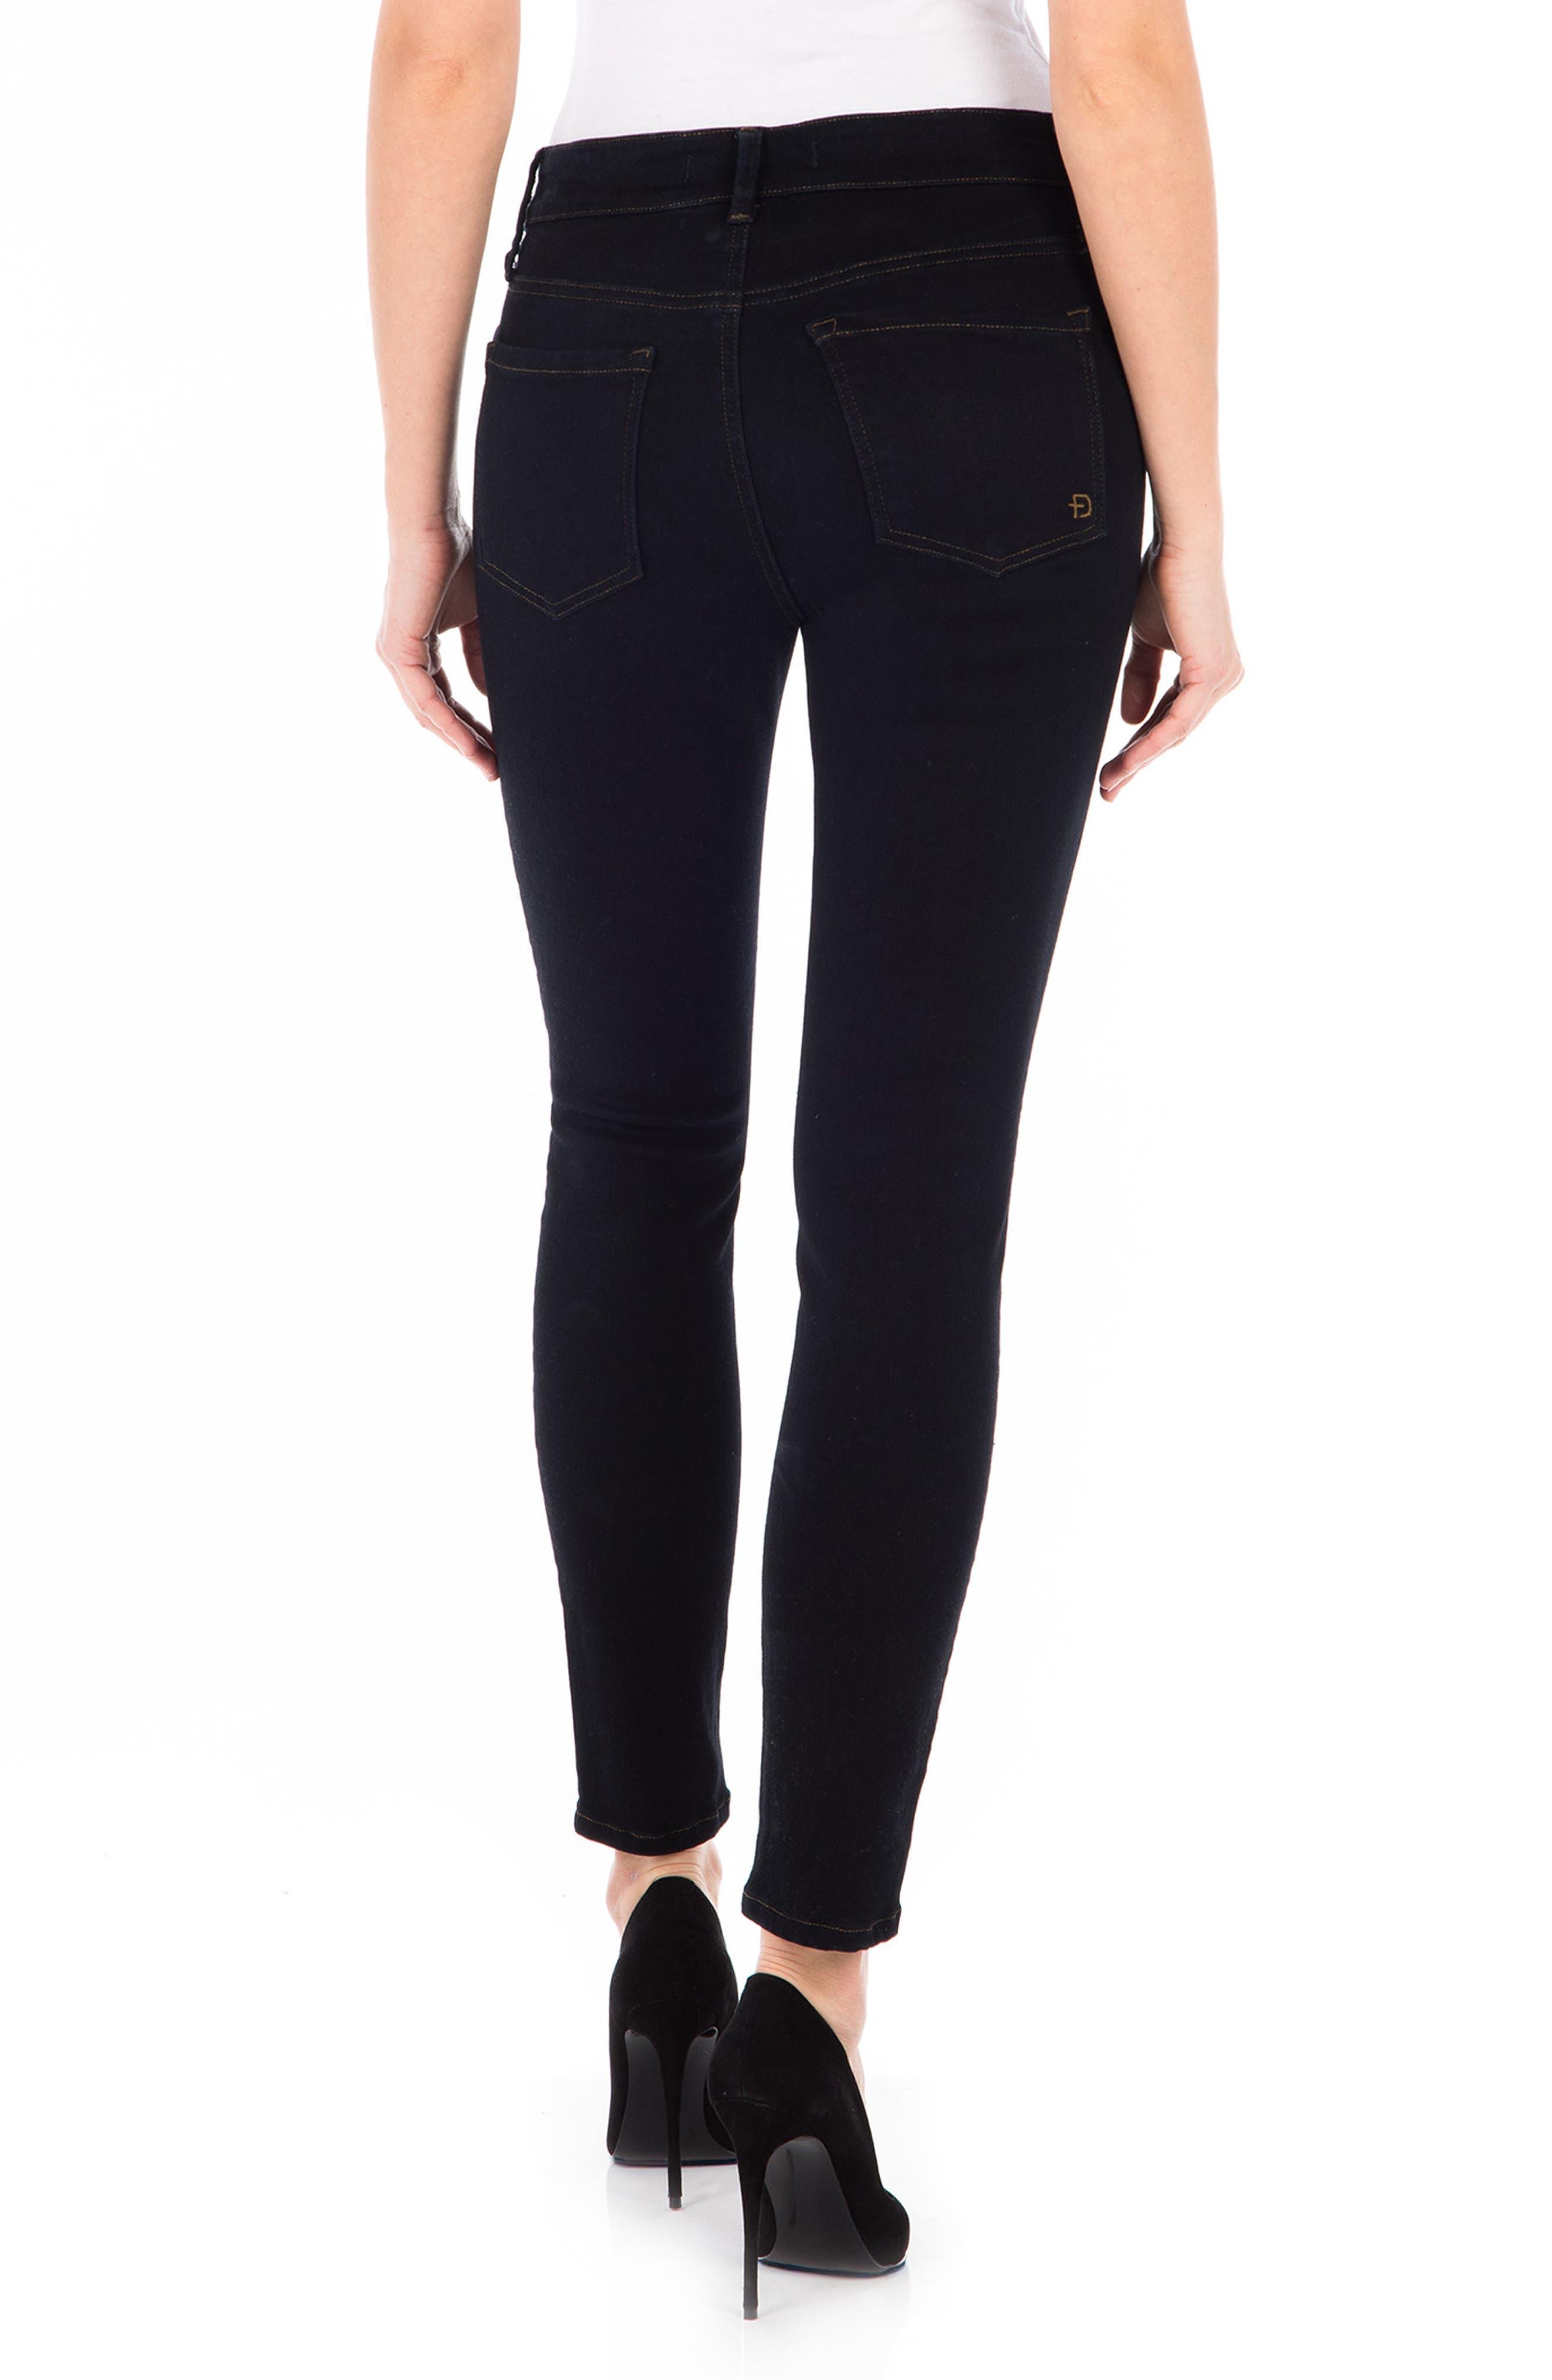 Sola Skinny Jeans,                             Alternate thumbnail 2, color,                             Navy Noir